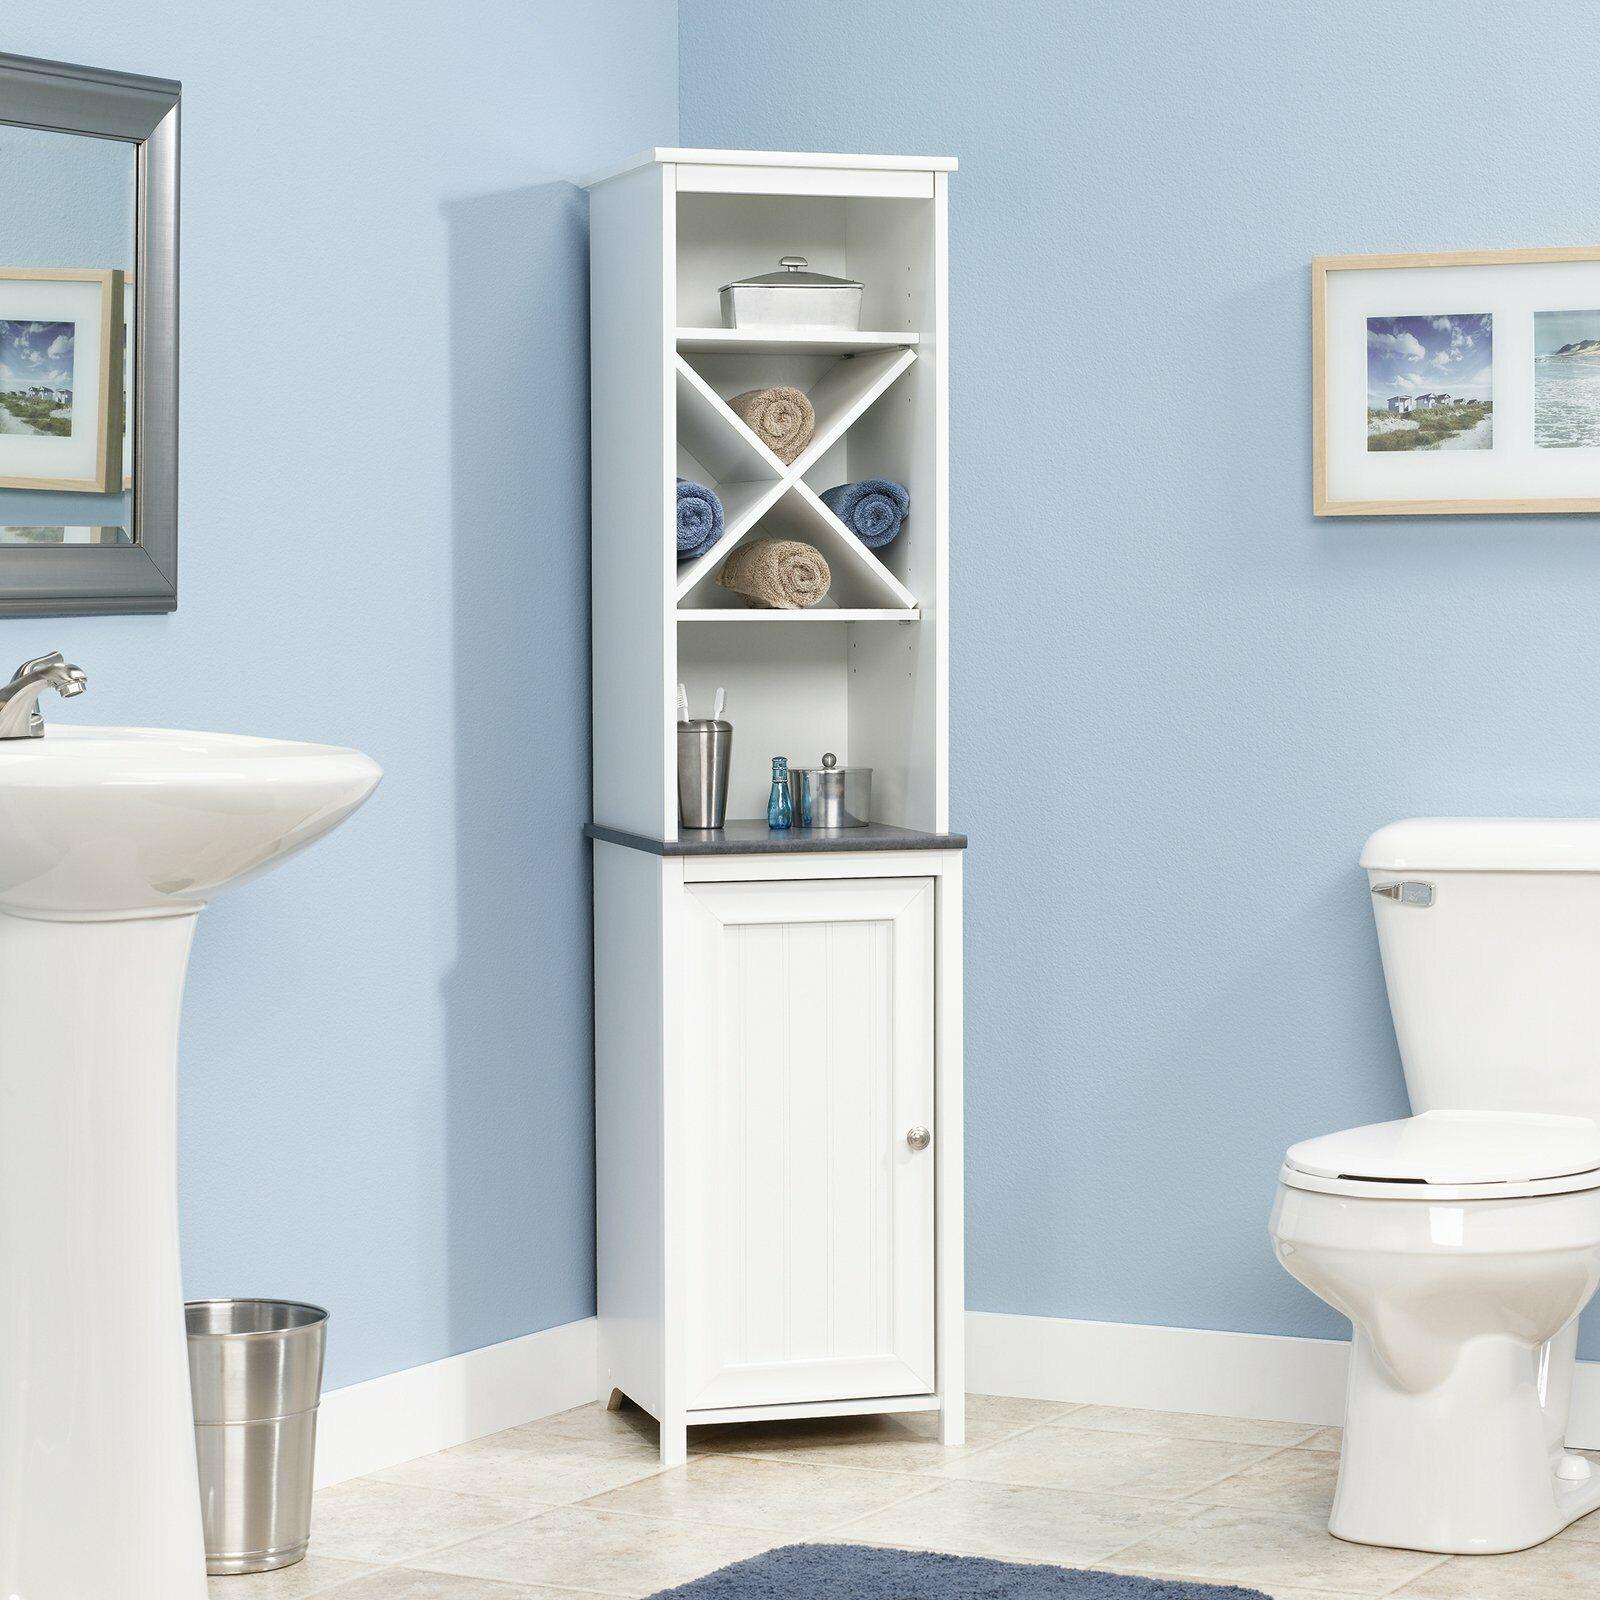 Tall Corner Shelf White 2 Shutter Doors Bathroom Storage Linen Cabinet Display For Sale Online Ebay